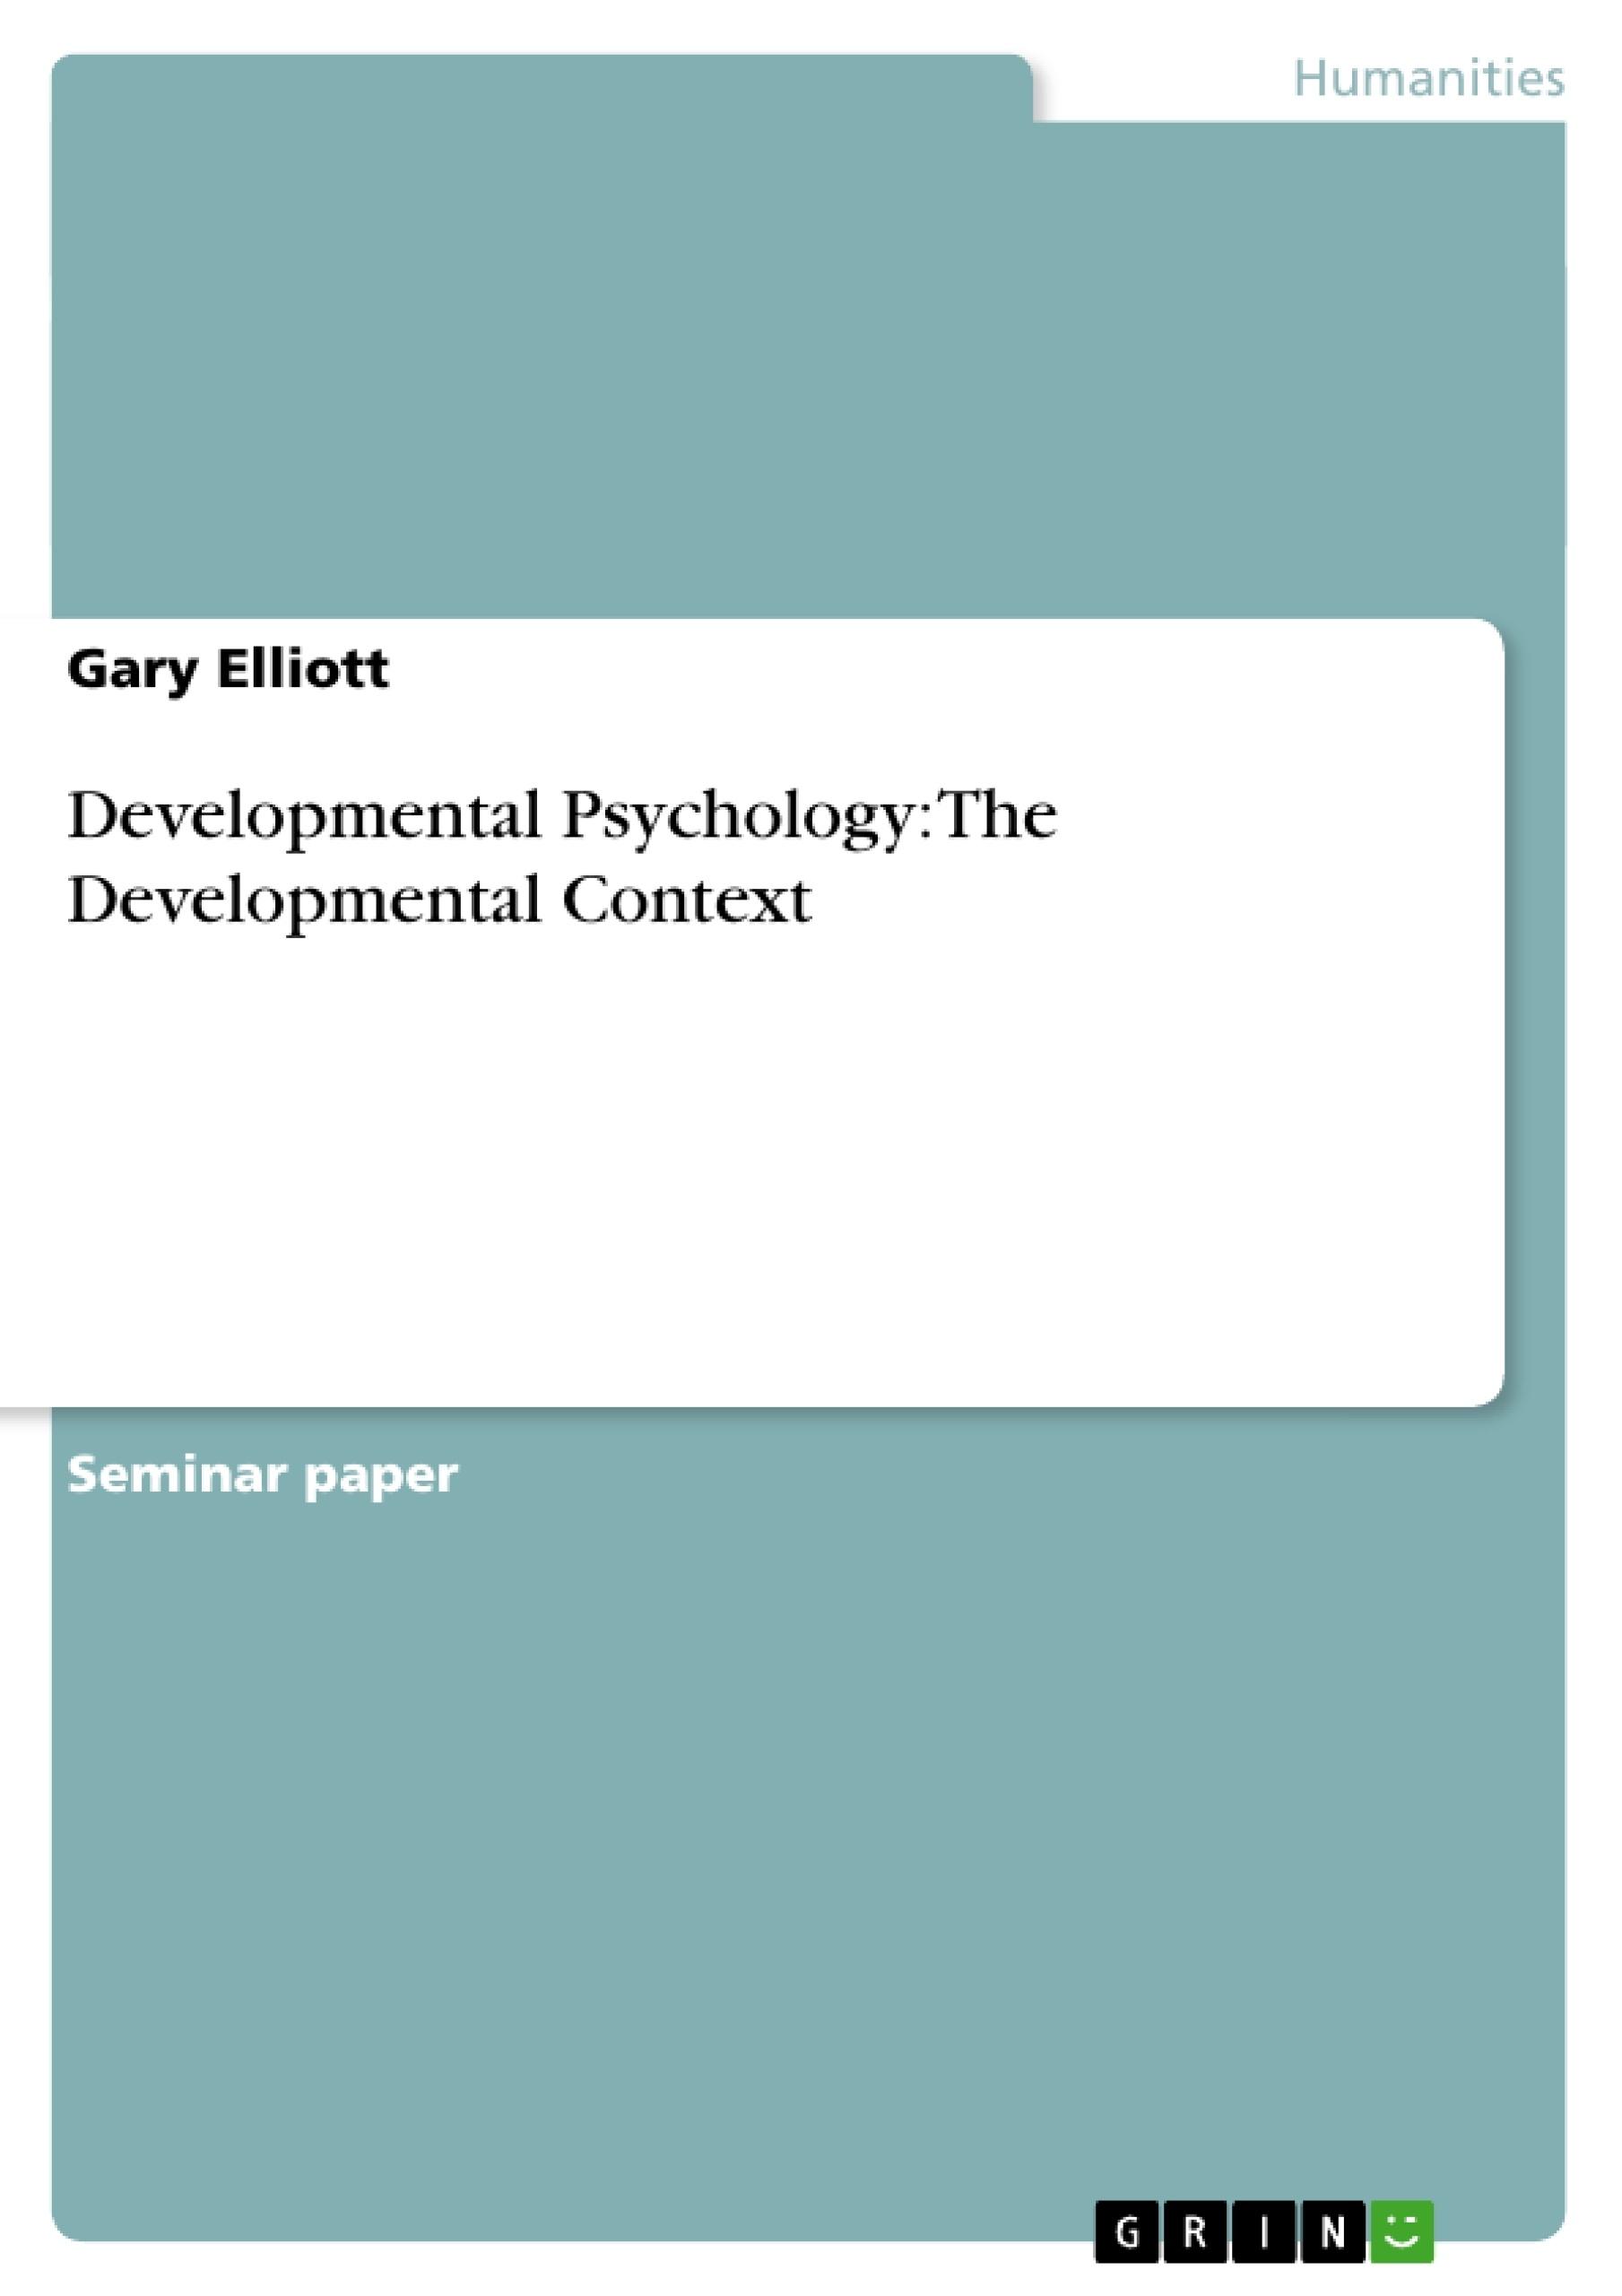 Title: Developmental Psychology: The Developmental Context